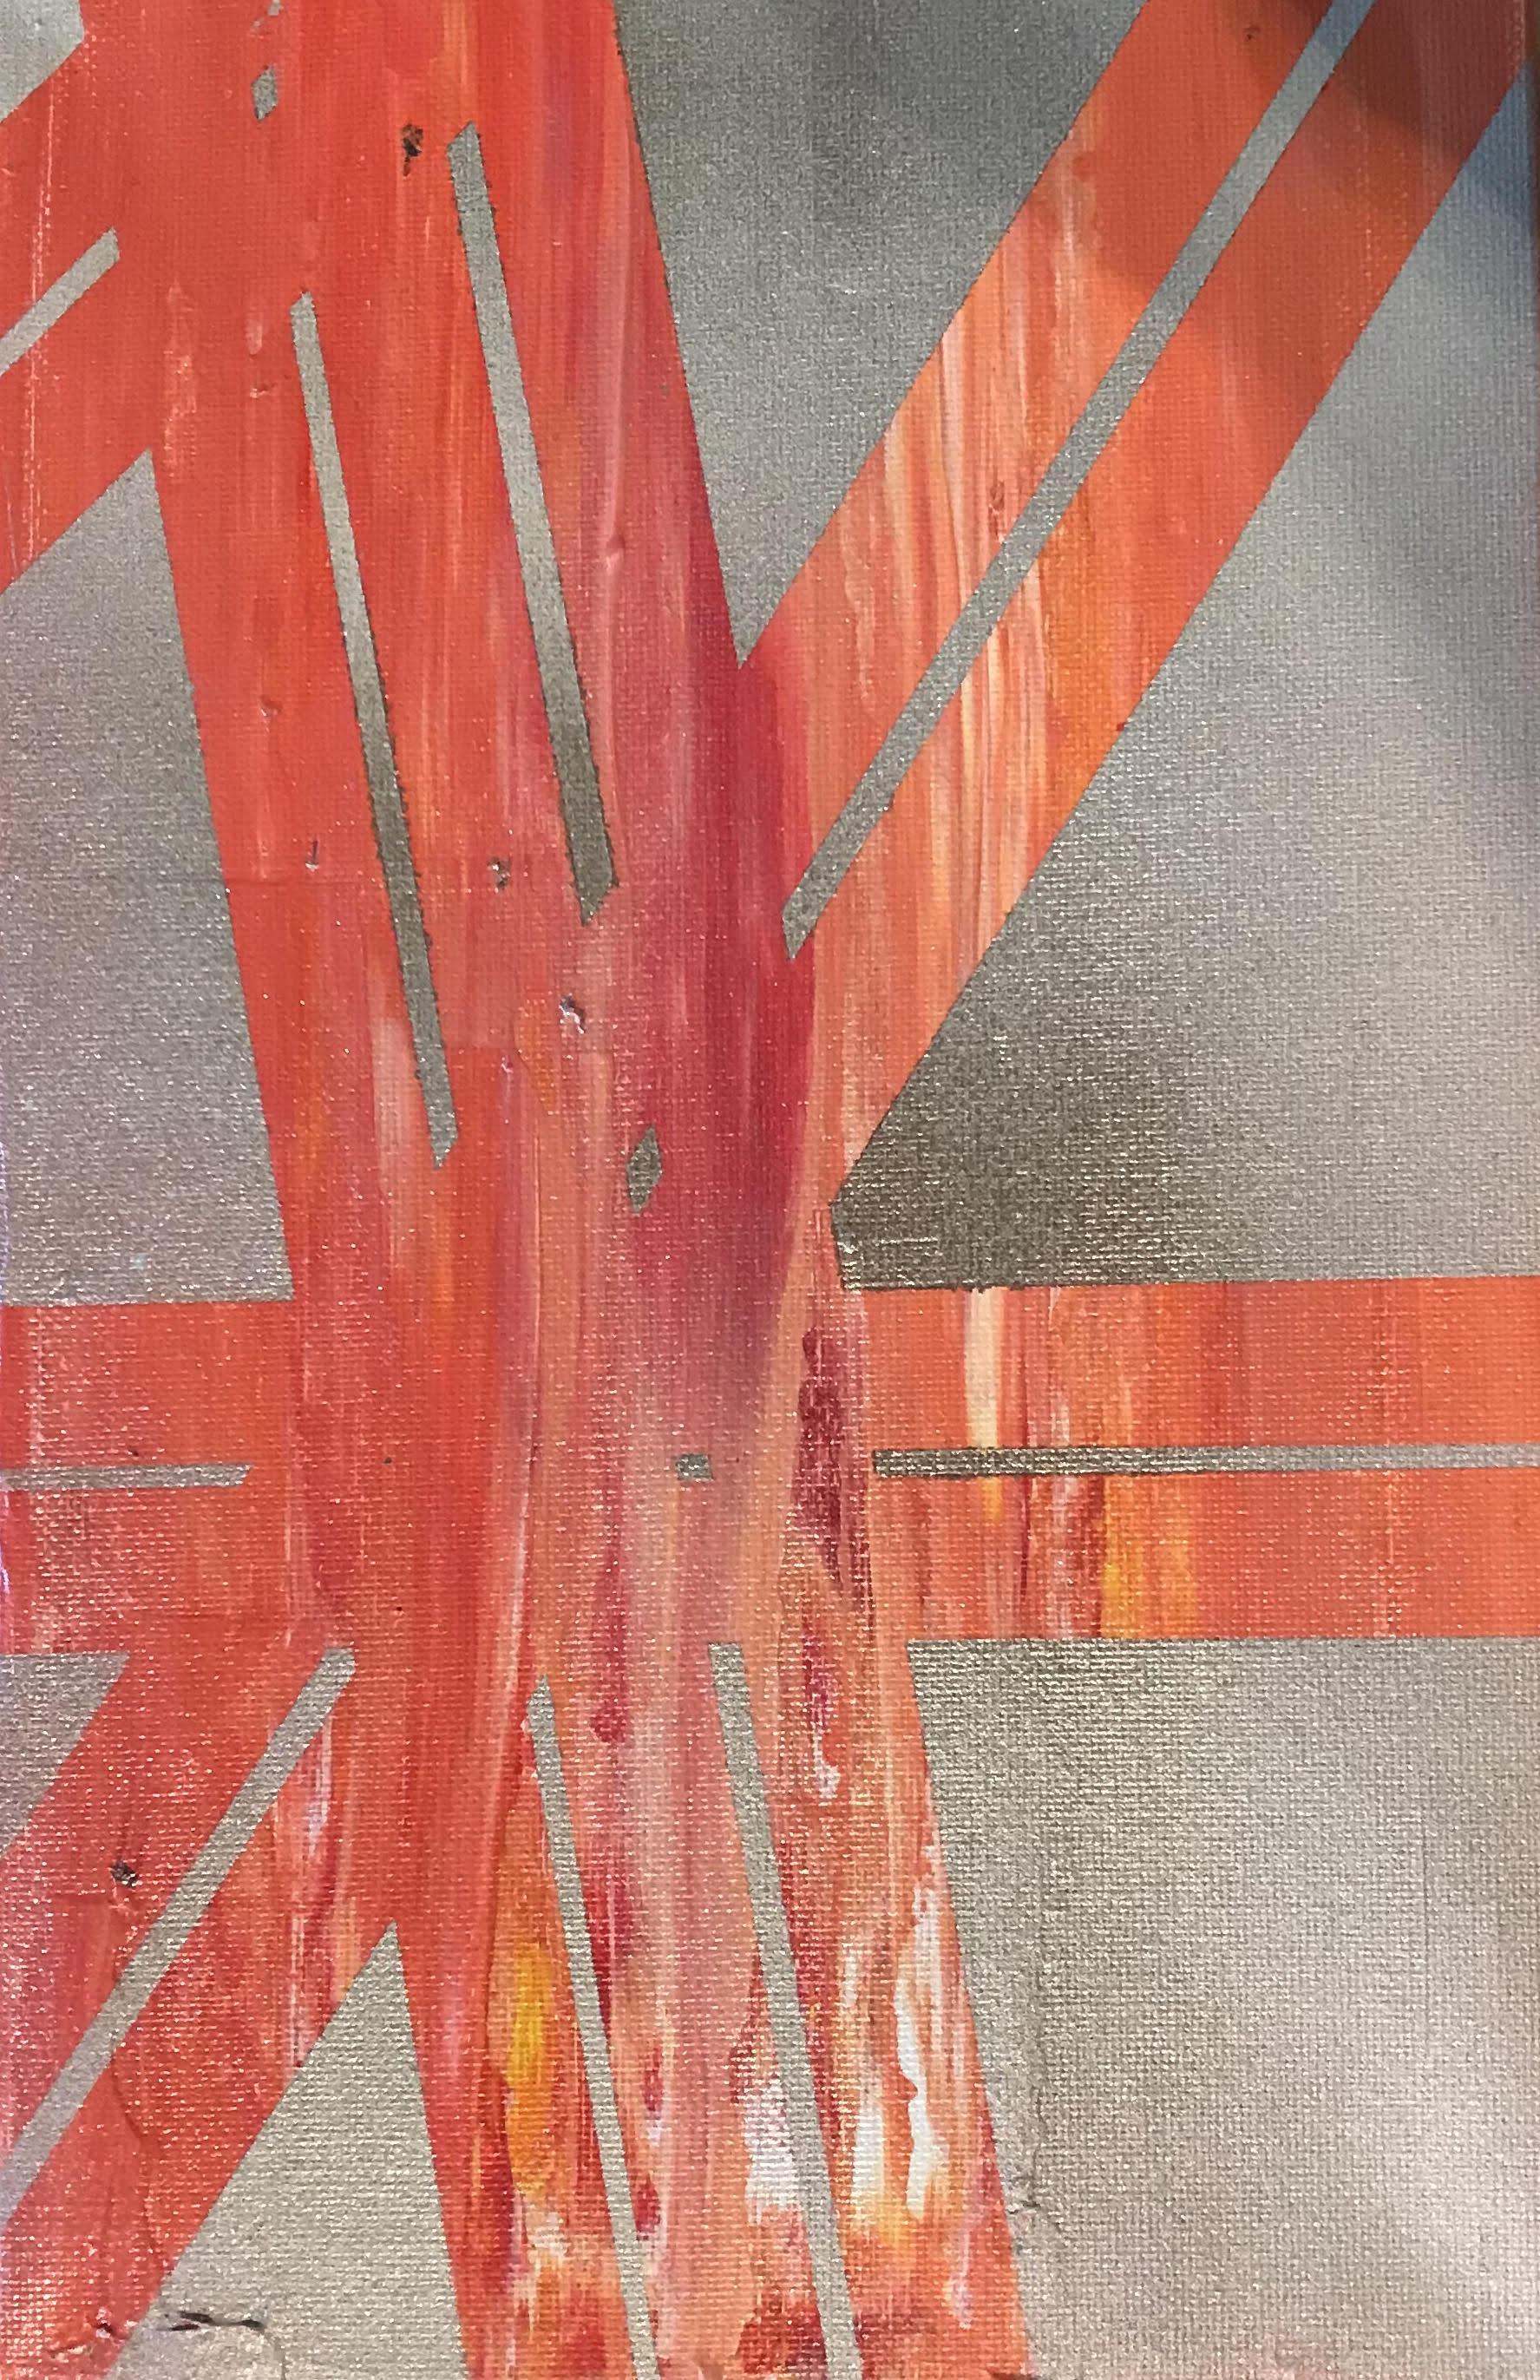 Cranes for DaysNo 2 - Spray Paint/Acrylic